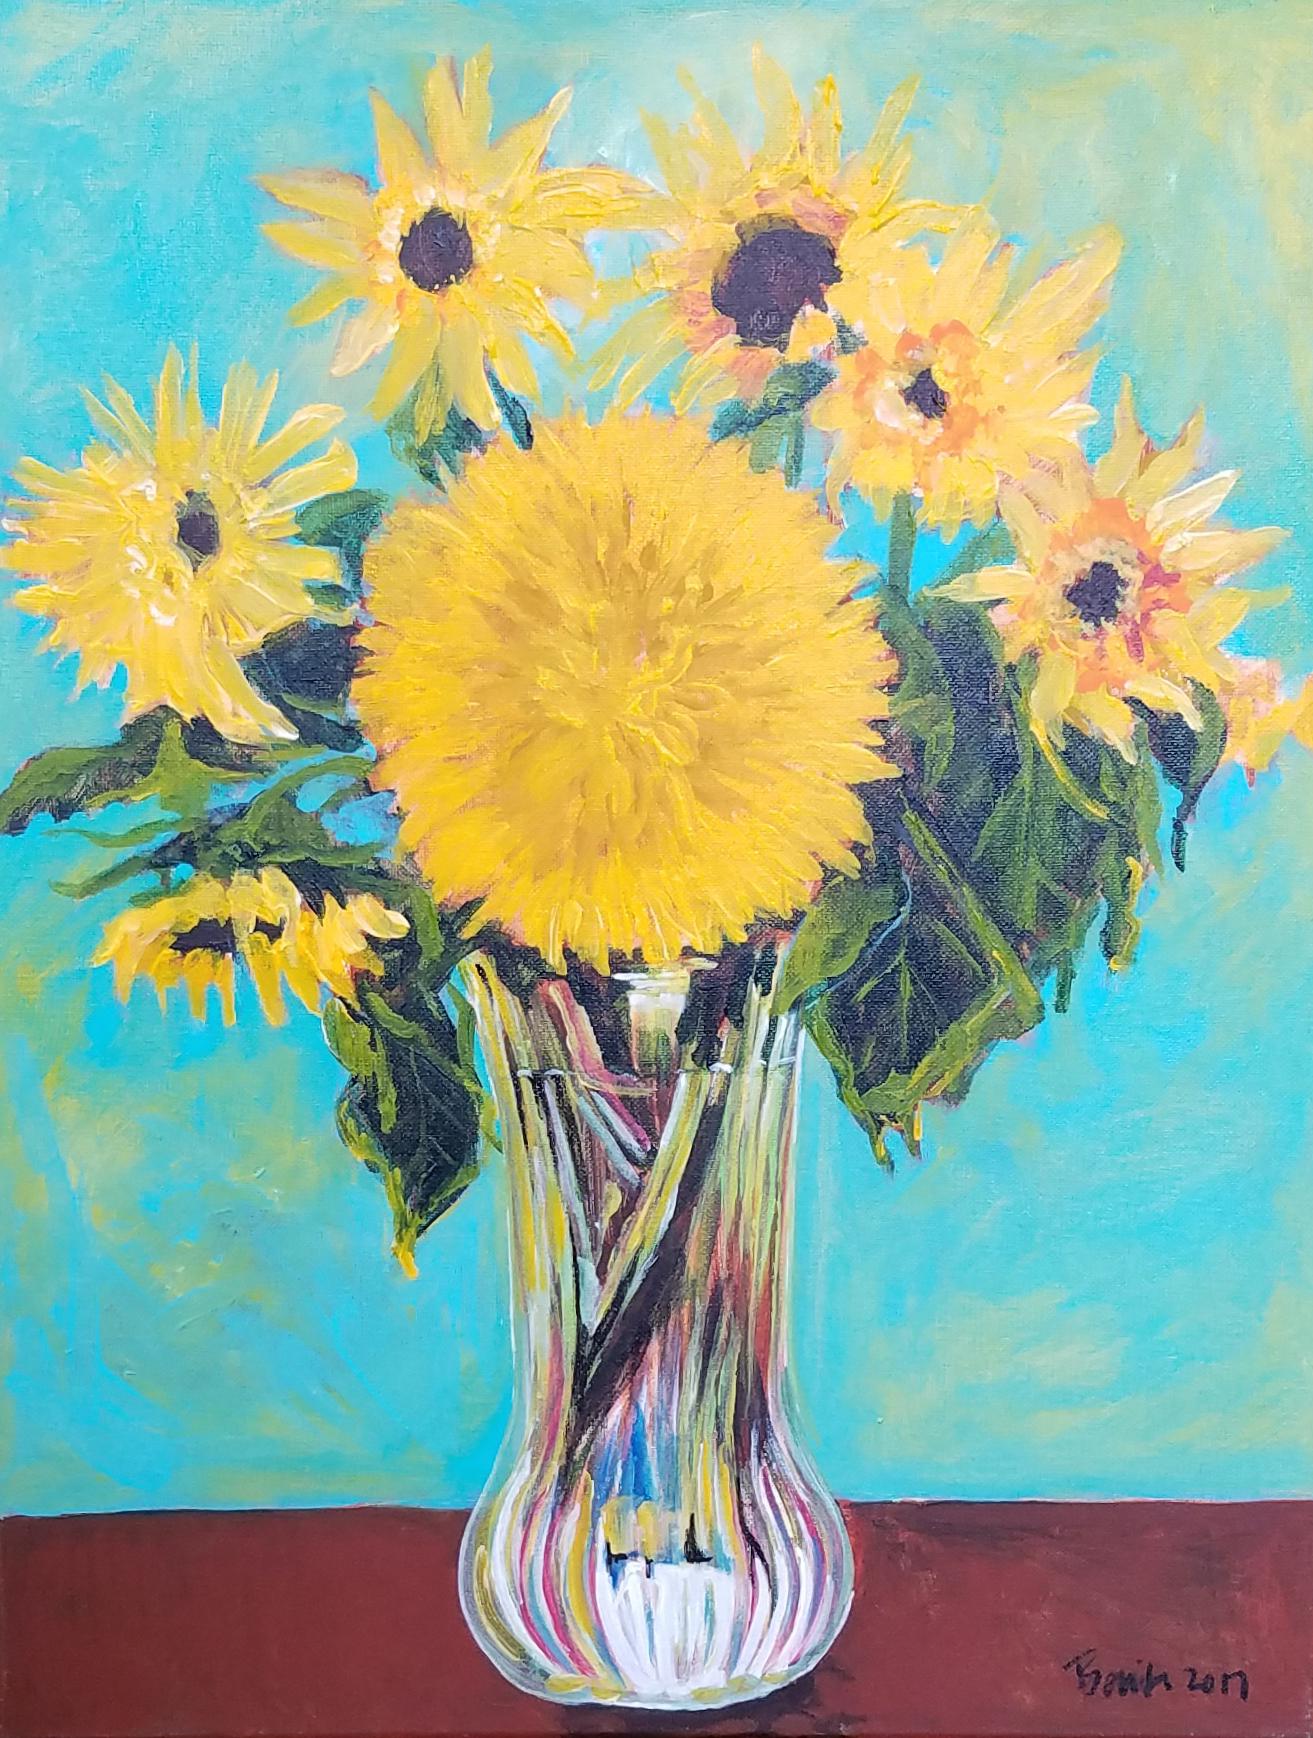 Benita Cole, Van Gogh Sunflowers, acrylic